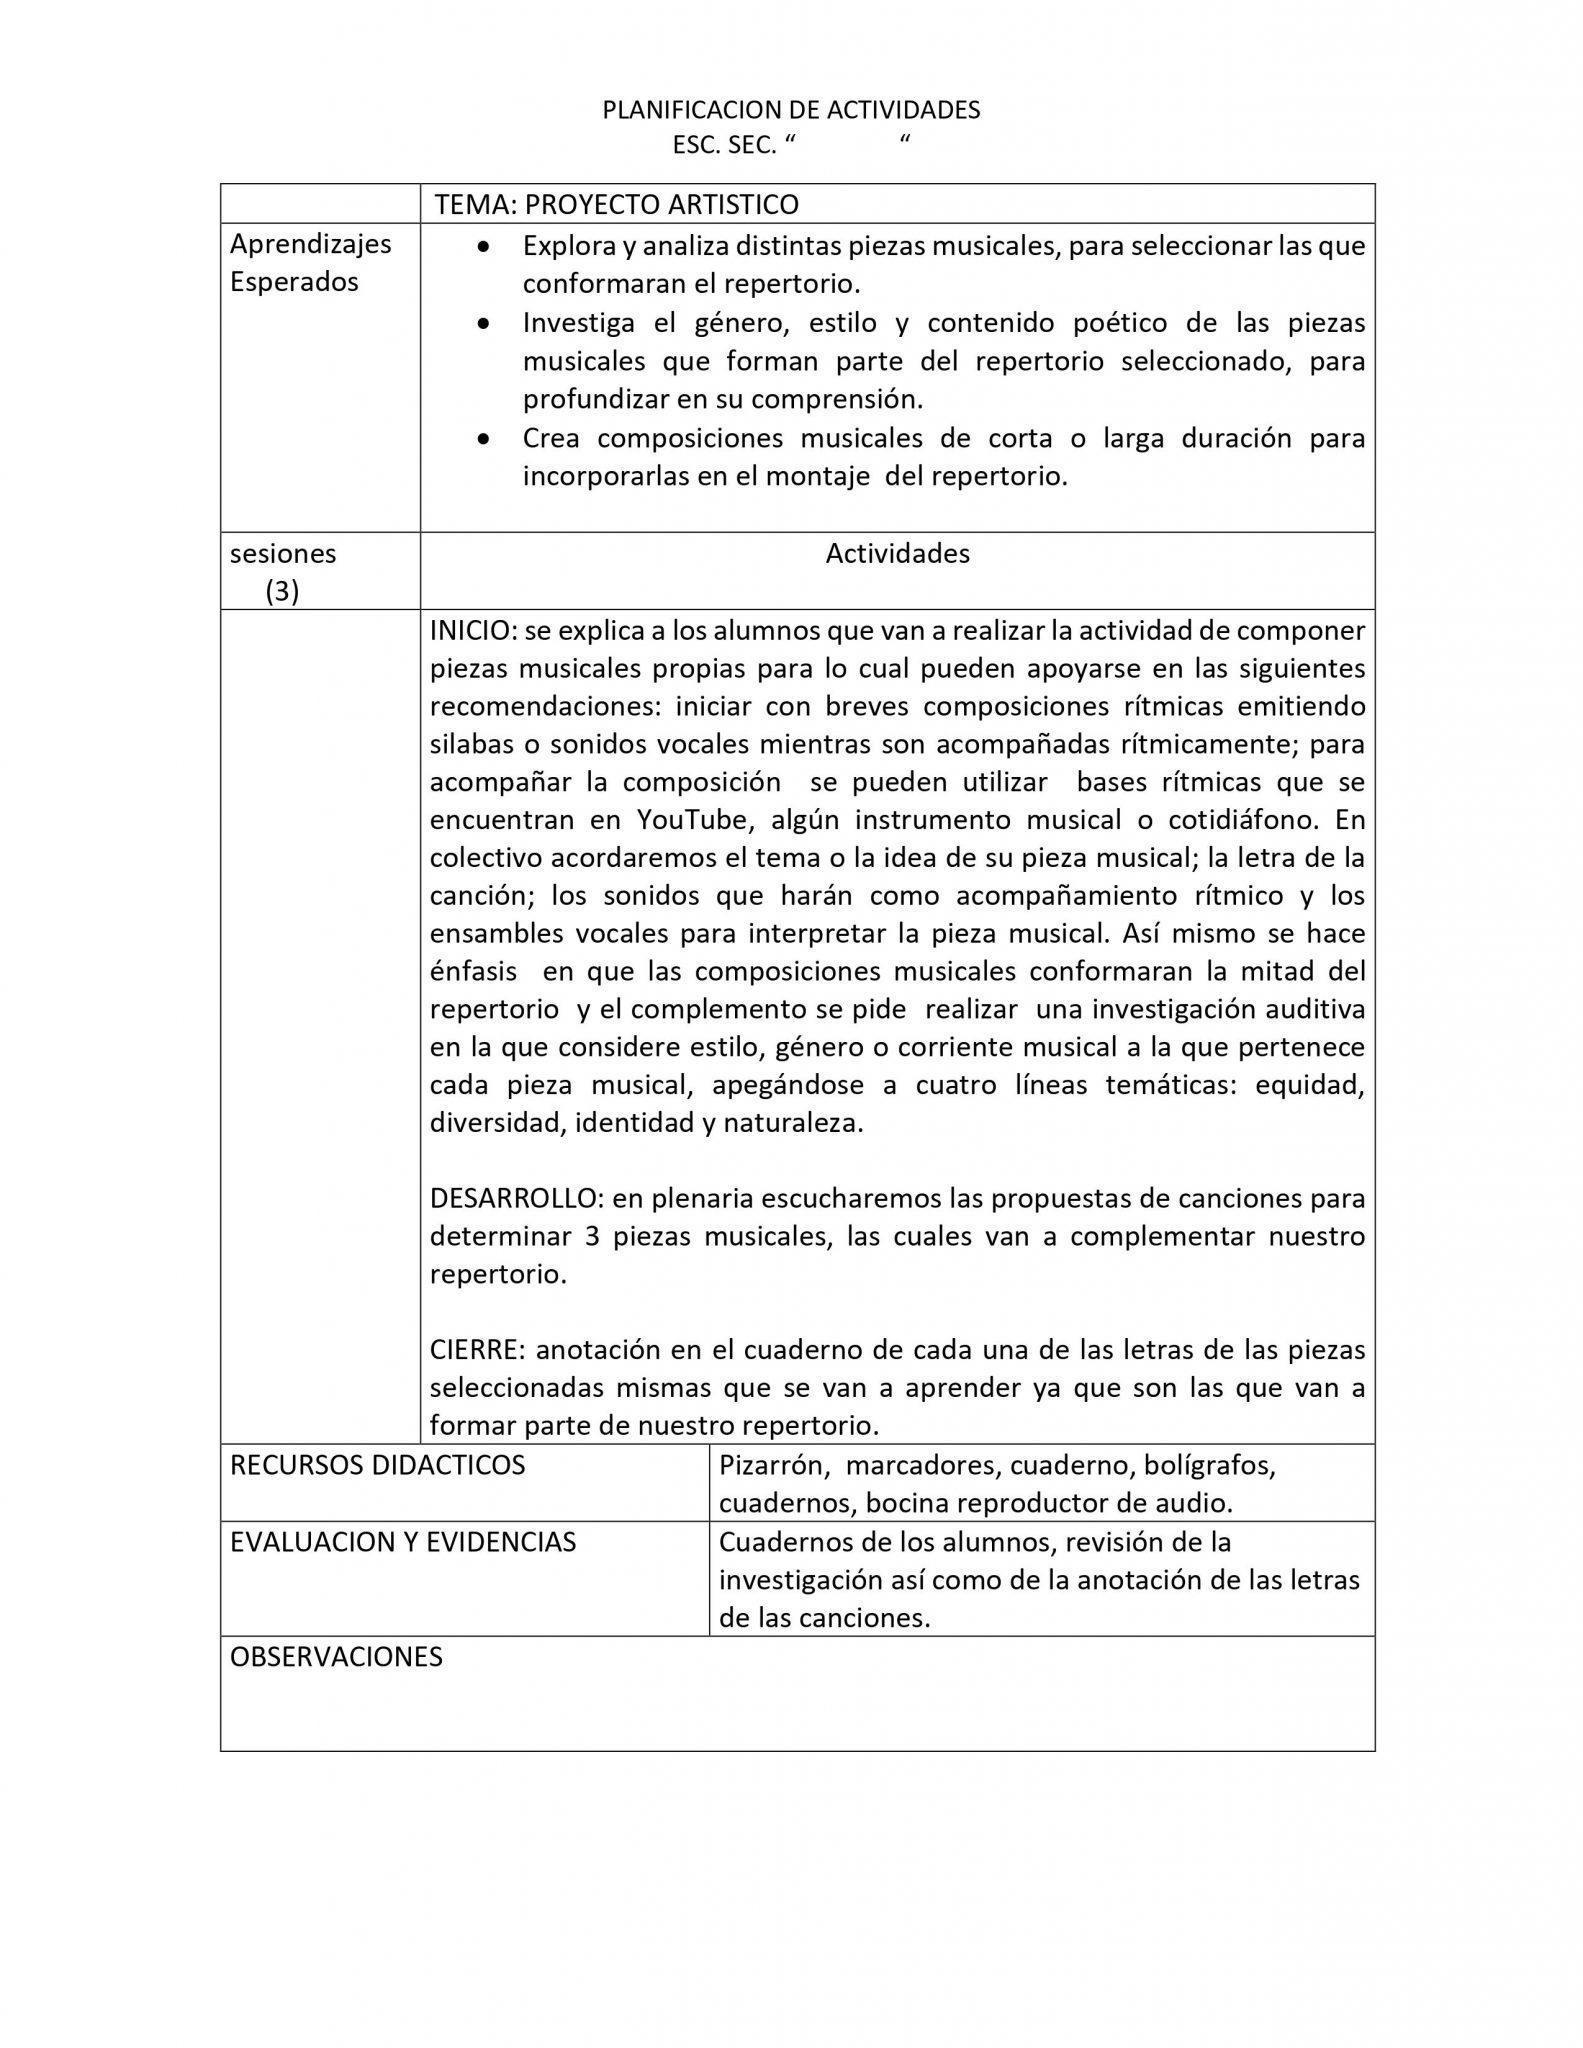 Planeaciones Artes Música 3 Secundaria (Nuevo Modelo Educativo) 1er. Trimestre 03